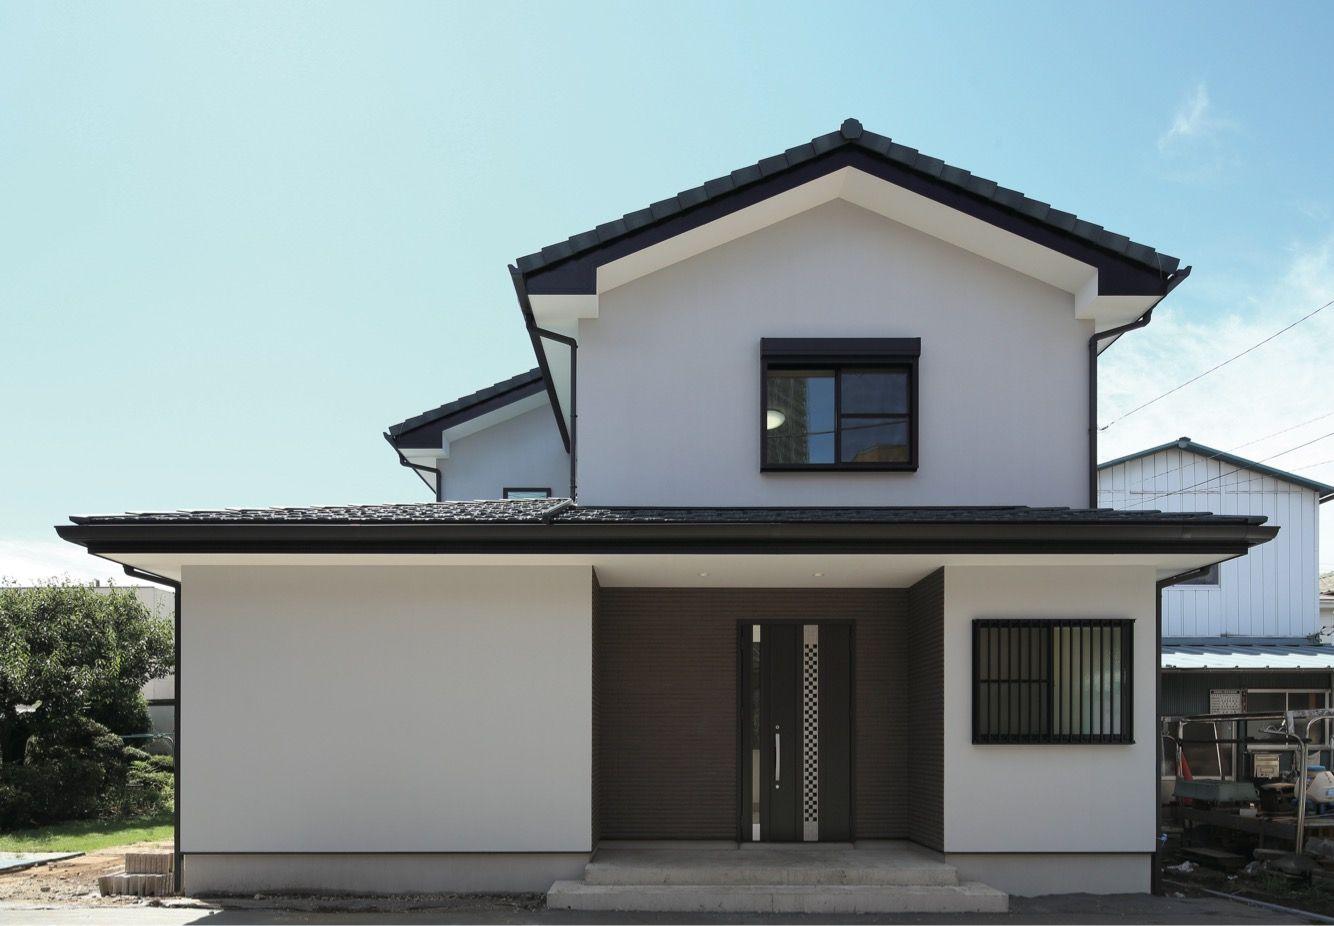 Exterior 外観 おしゃれまとめの人気アイデア Pinterest Niim No Mori ホームウェア 健康 住宅 建築家